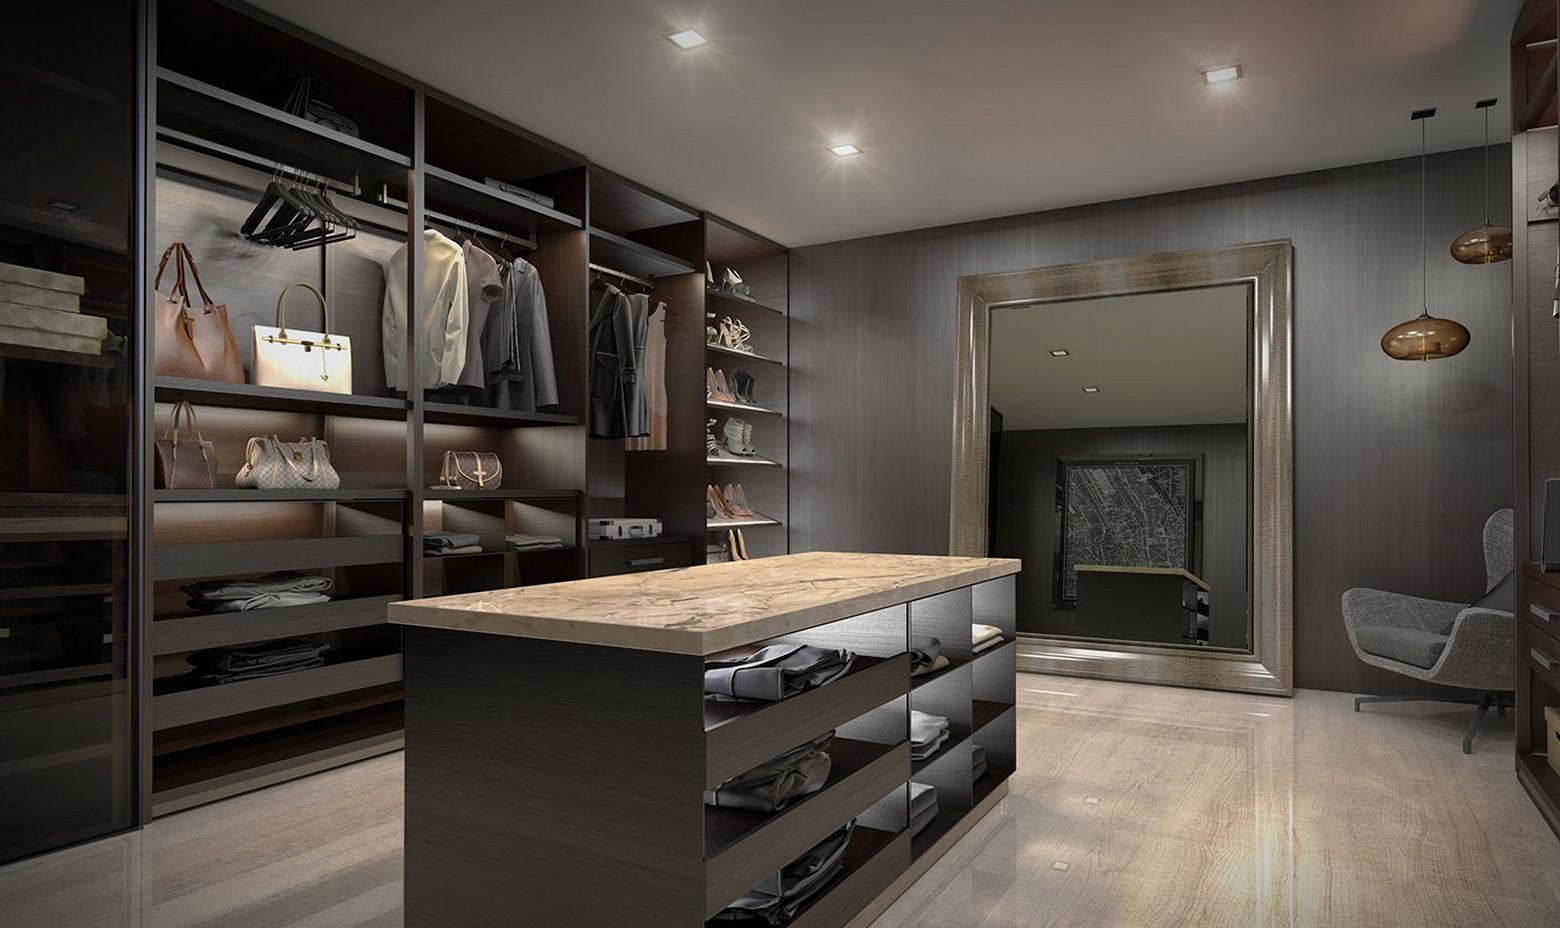 miami walkin closet